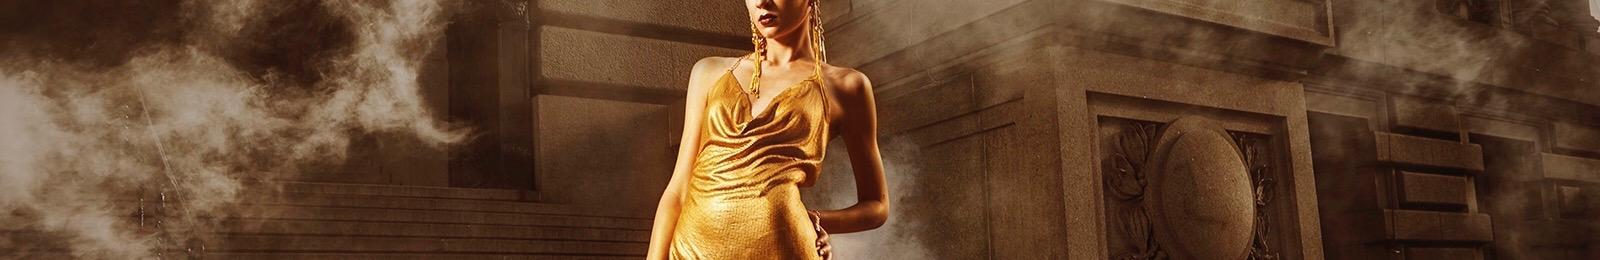 'Gotham Goddess'- Shot:The Financial District, Nyc